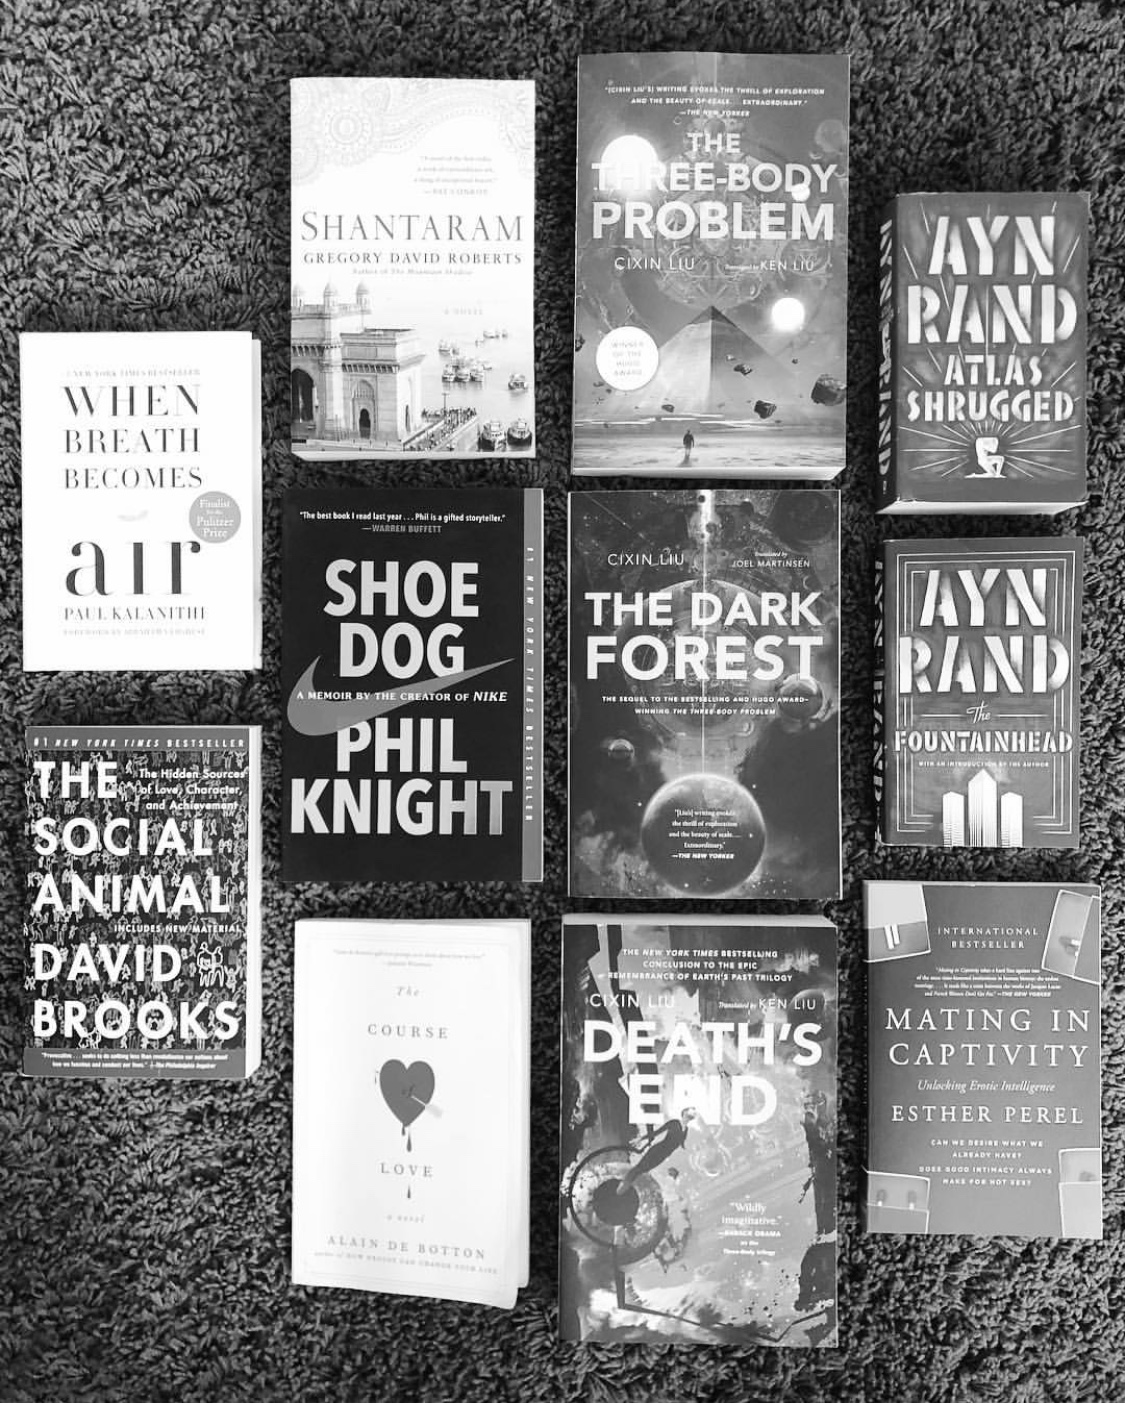 5-Star Books on Goodreads, taken by Renee C.